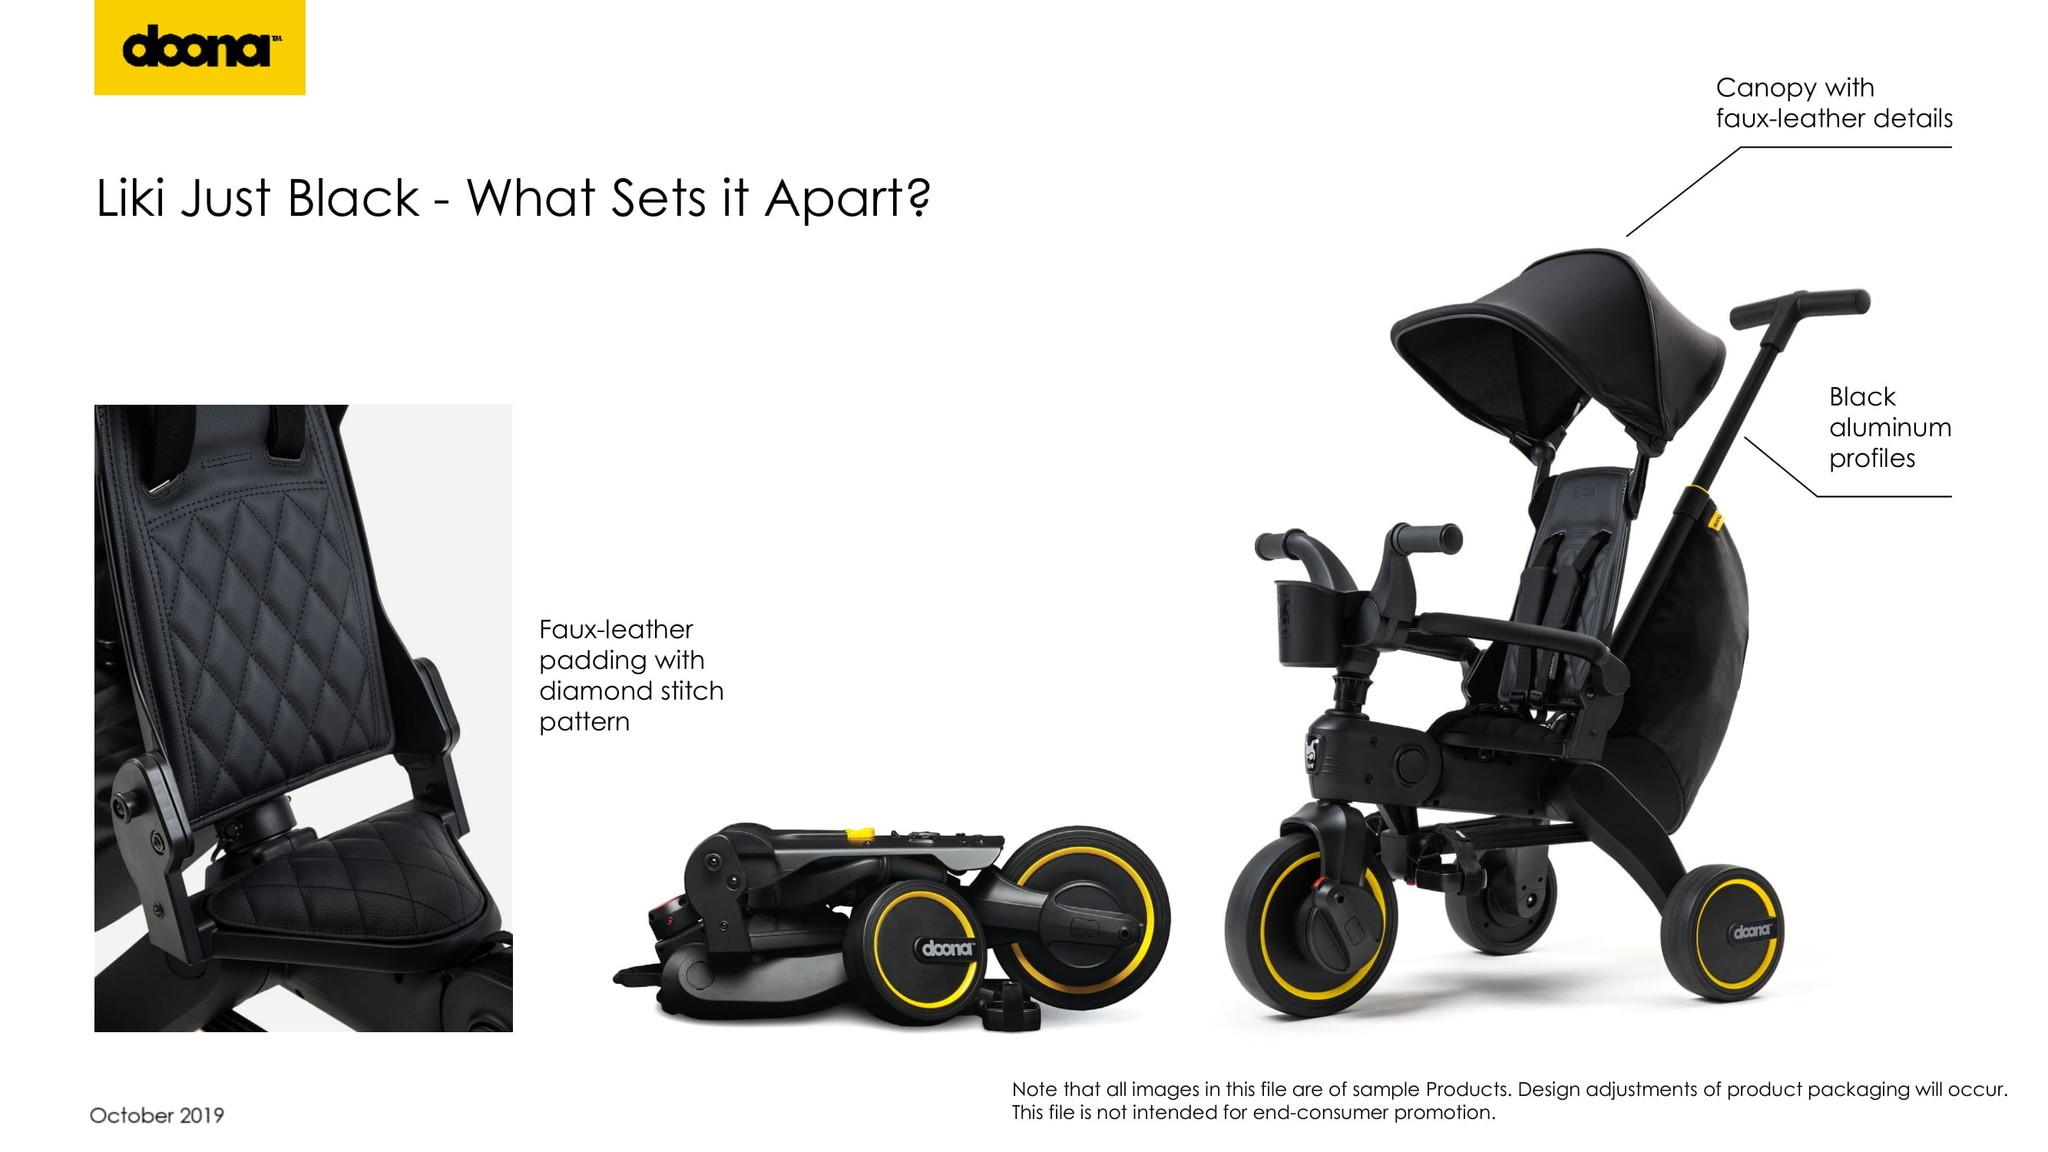 Doona Liki trike - Special Edition Just Black